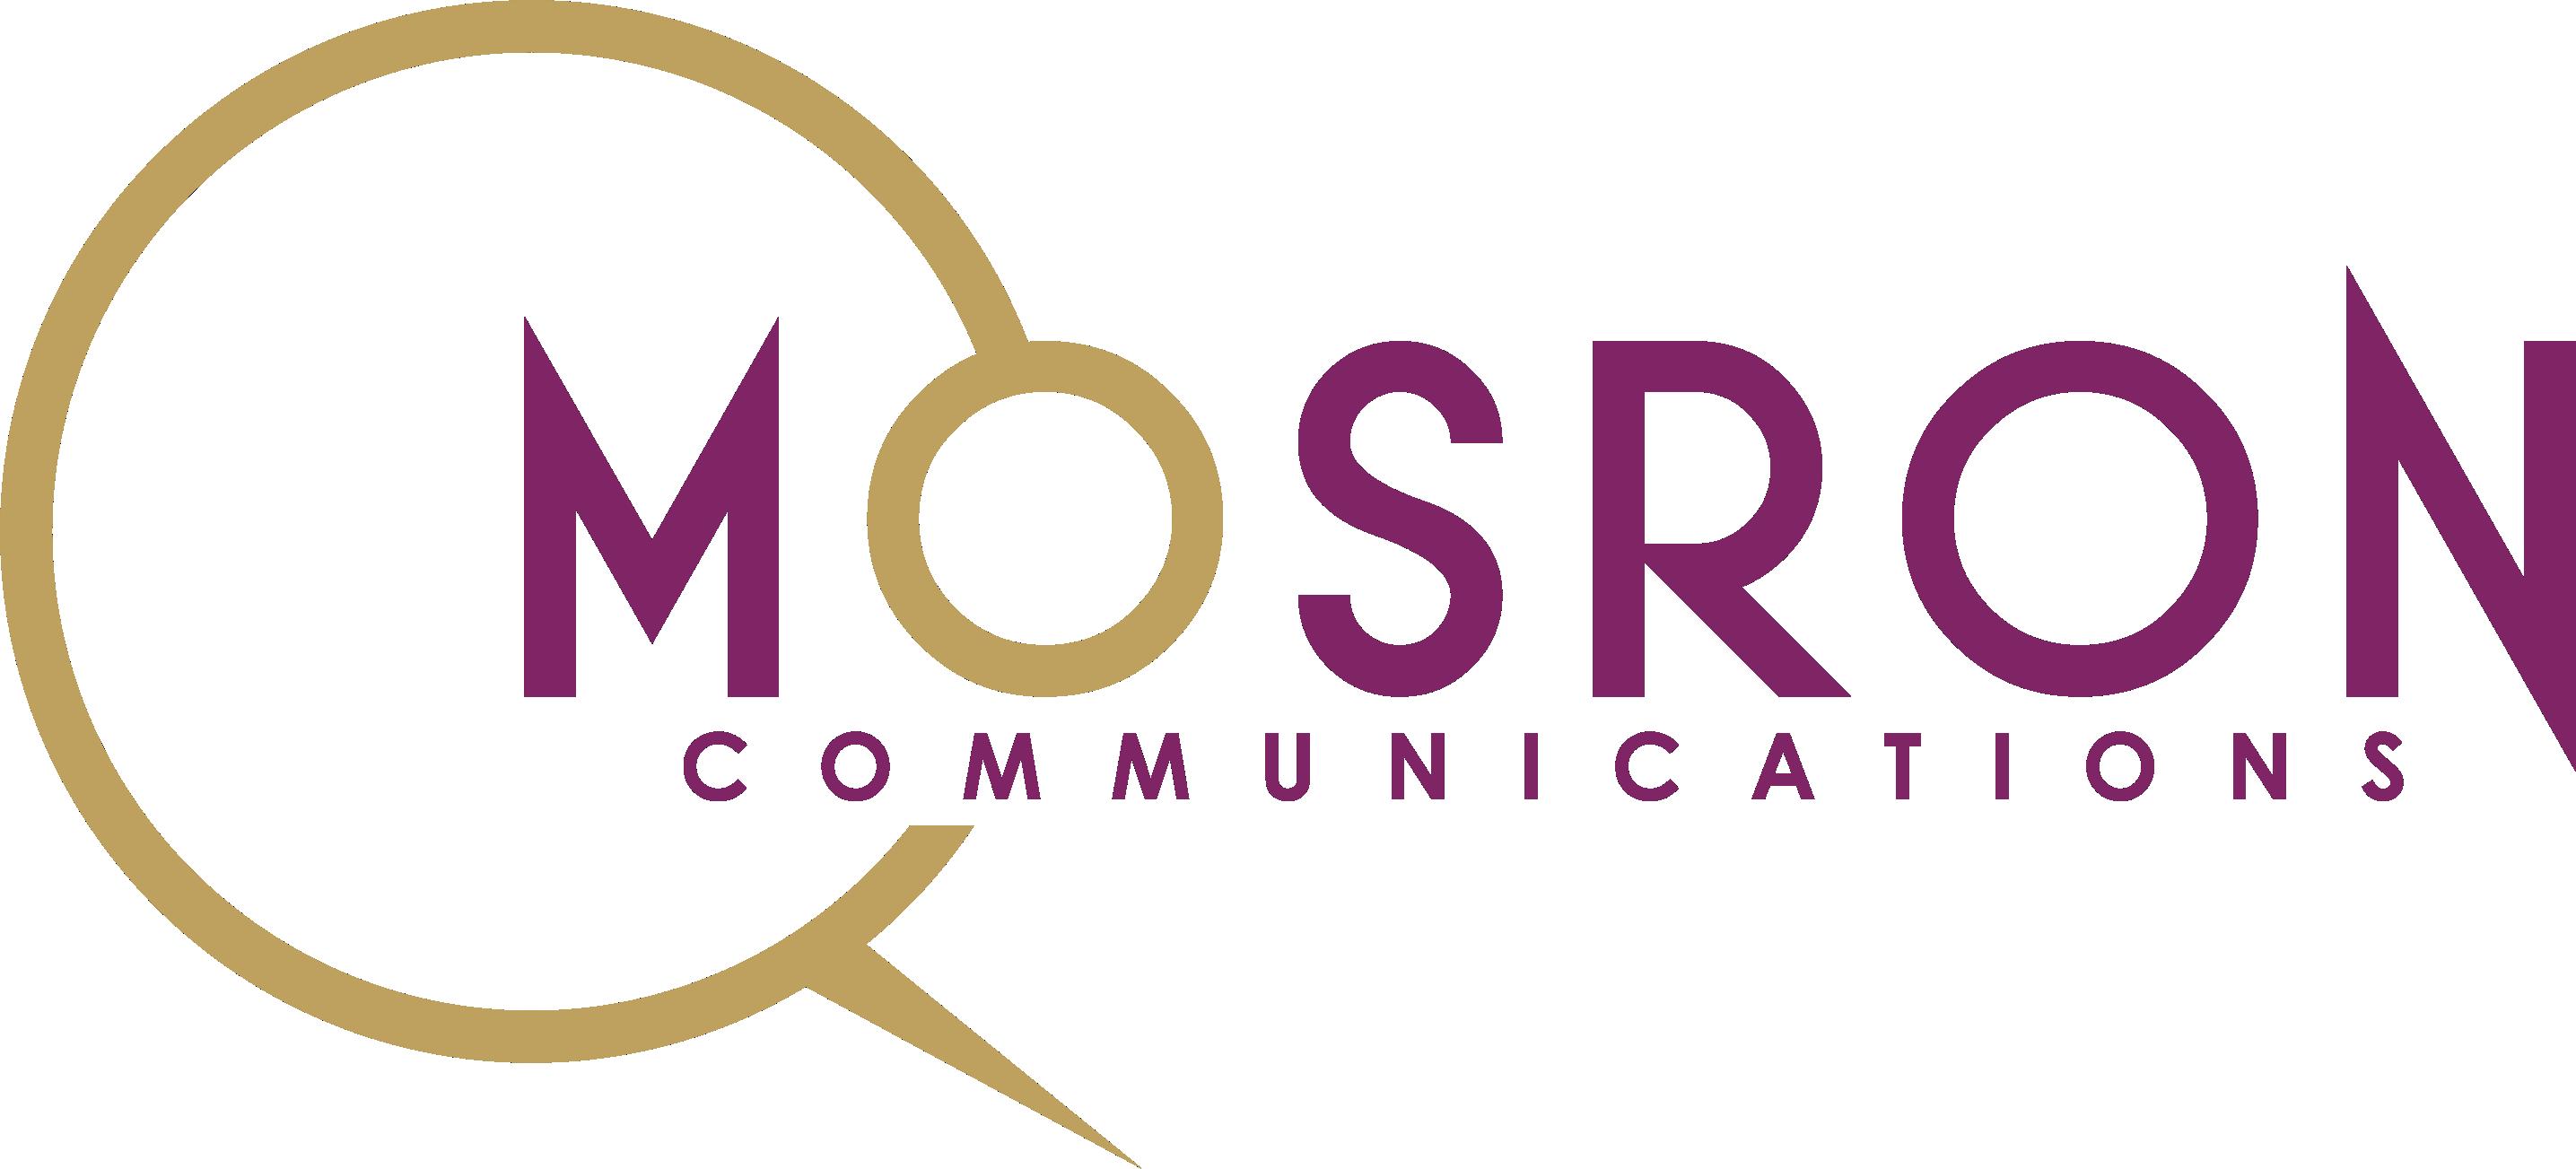 Mosron Communications